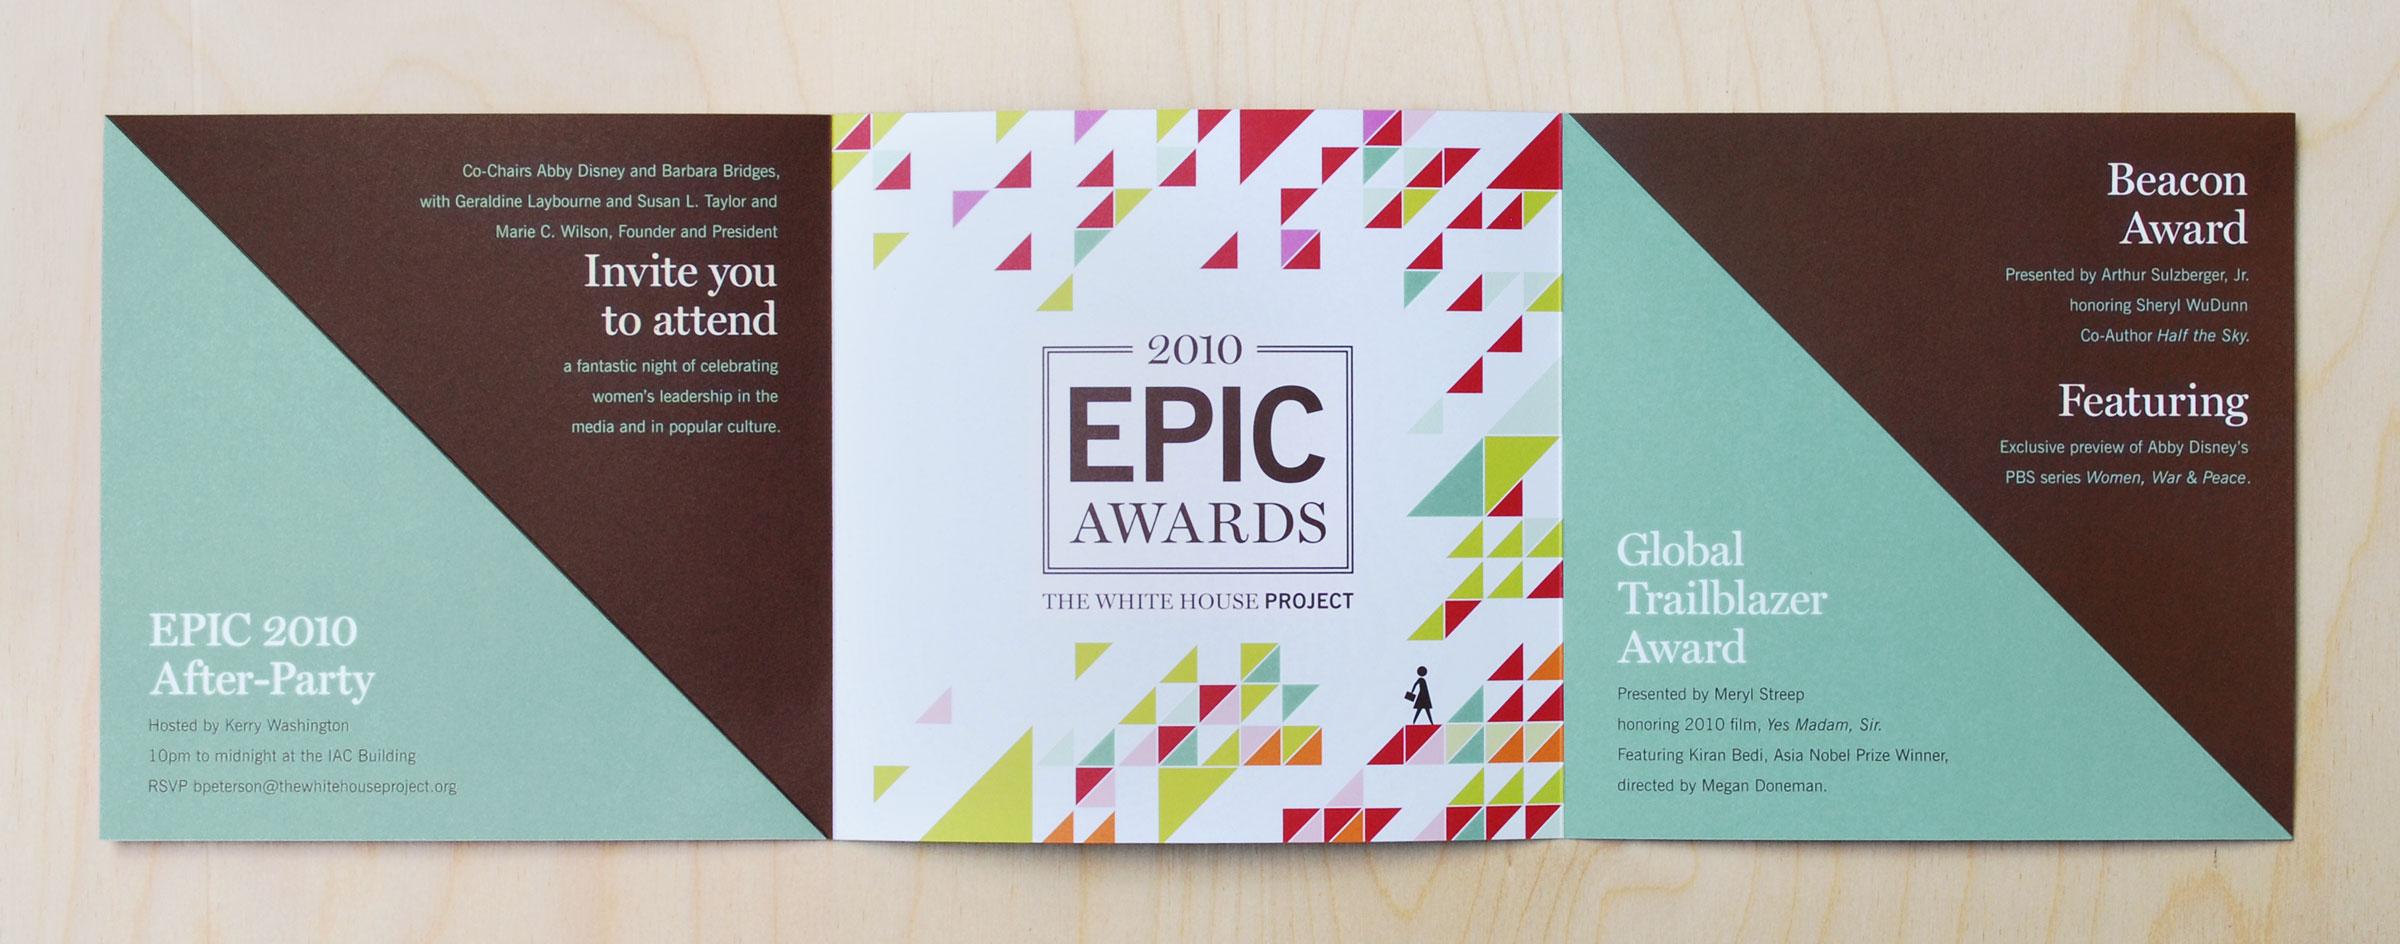 Brosur TWHP 2010 EPIC Awards